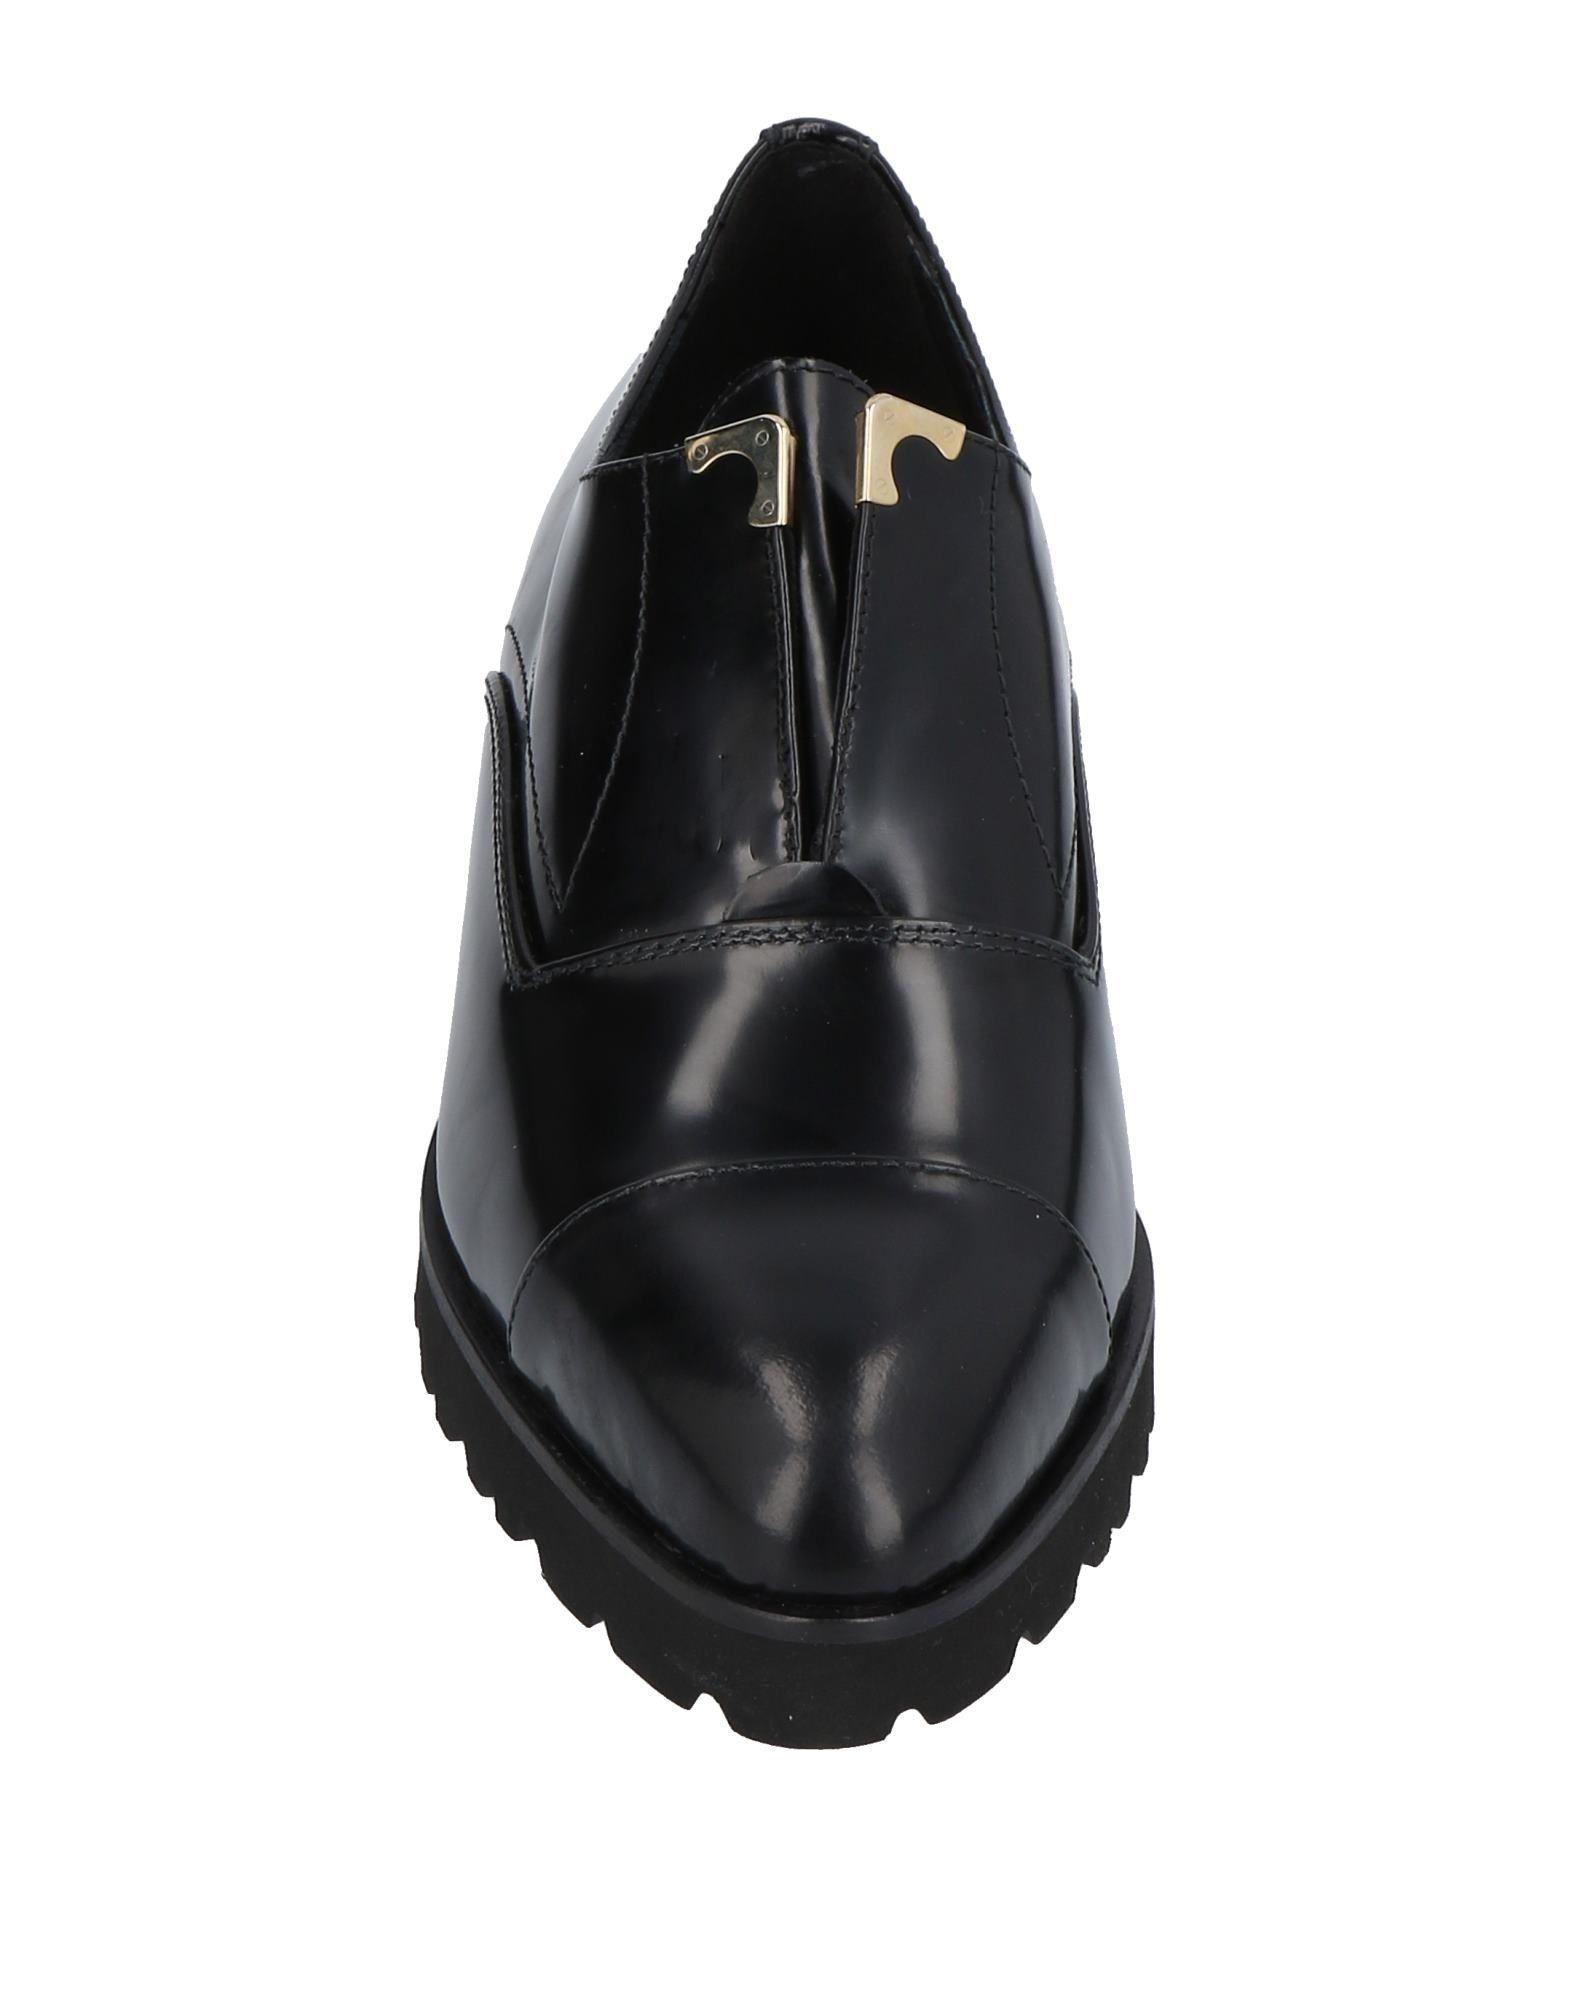 Samsonite Mokassins Qualität Damen  11468217AF Gute Qualität Mokassins beliebte Schuhe 788f32